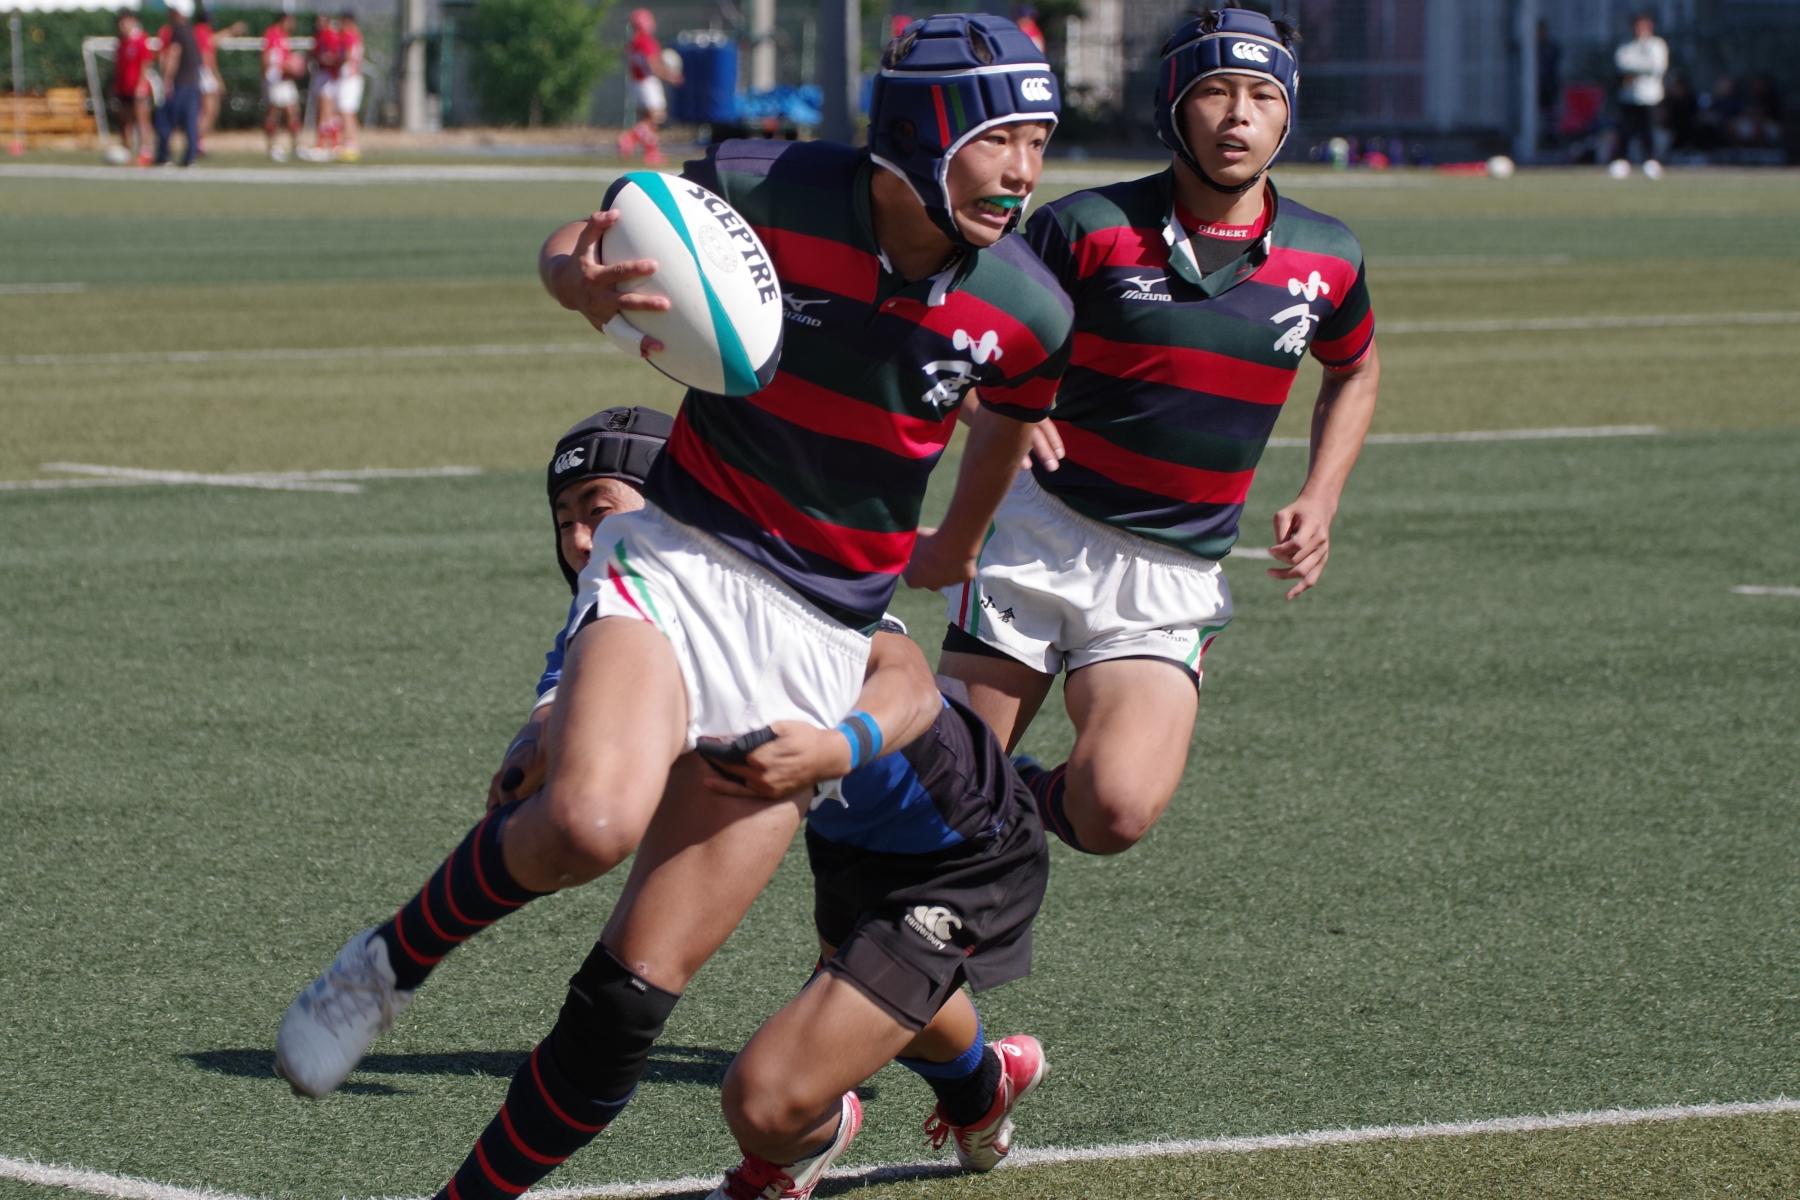 http://kokura-rugby.sakura.ne.jp/181021_130916_0918.jpg